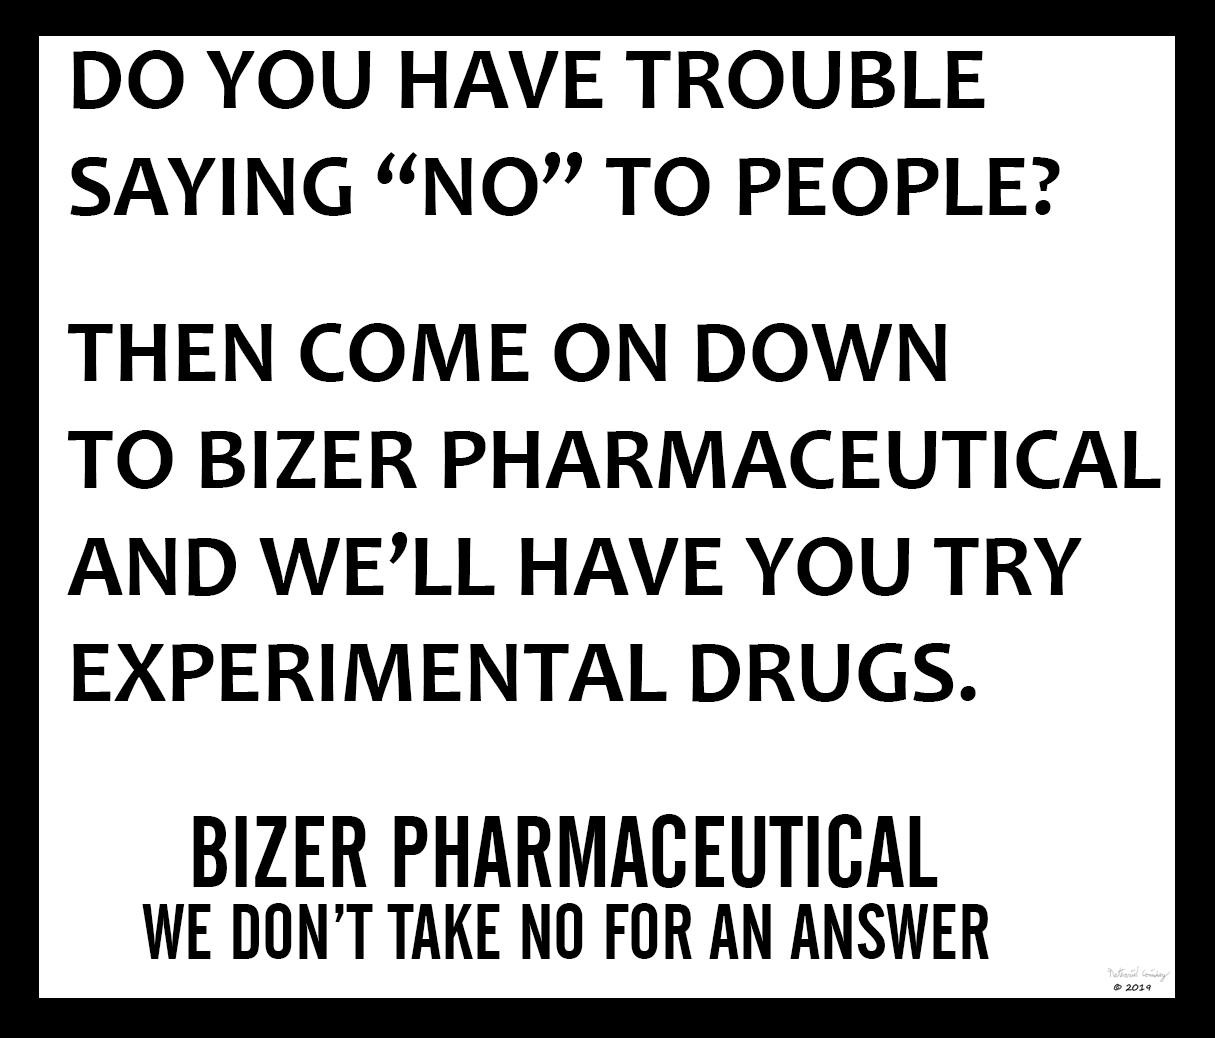 Bizer Pharmaceutical - Say No